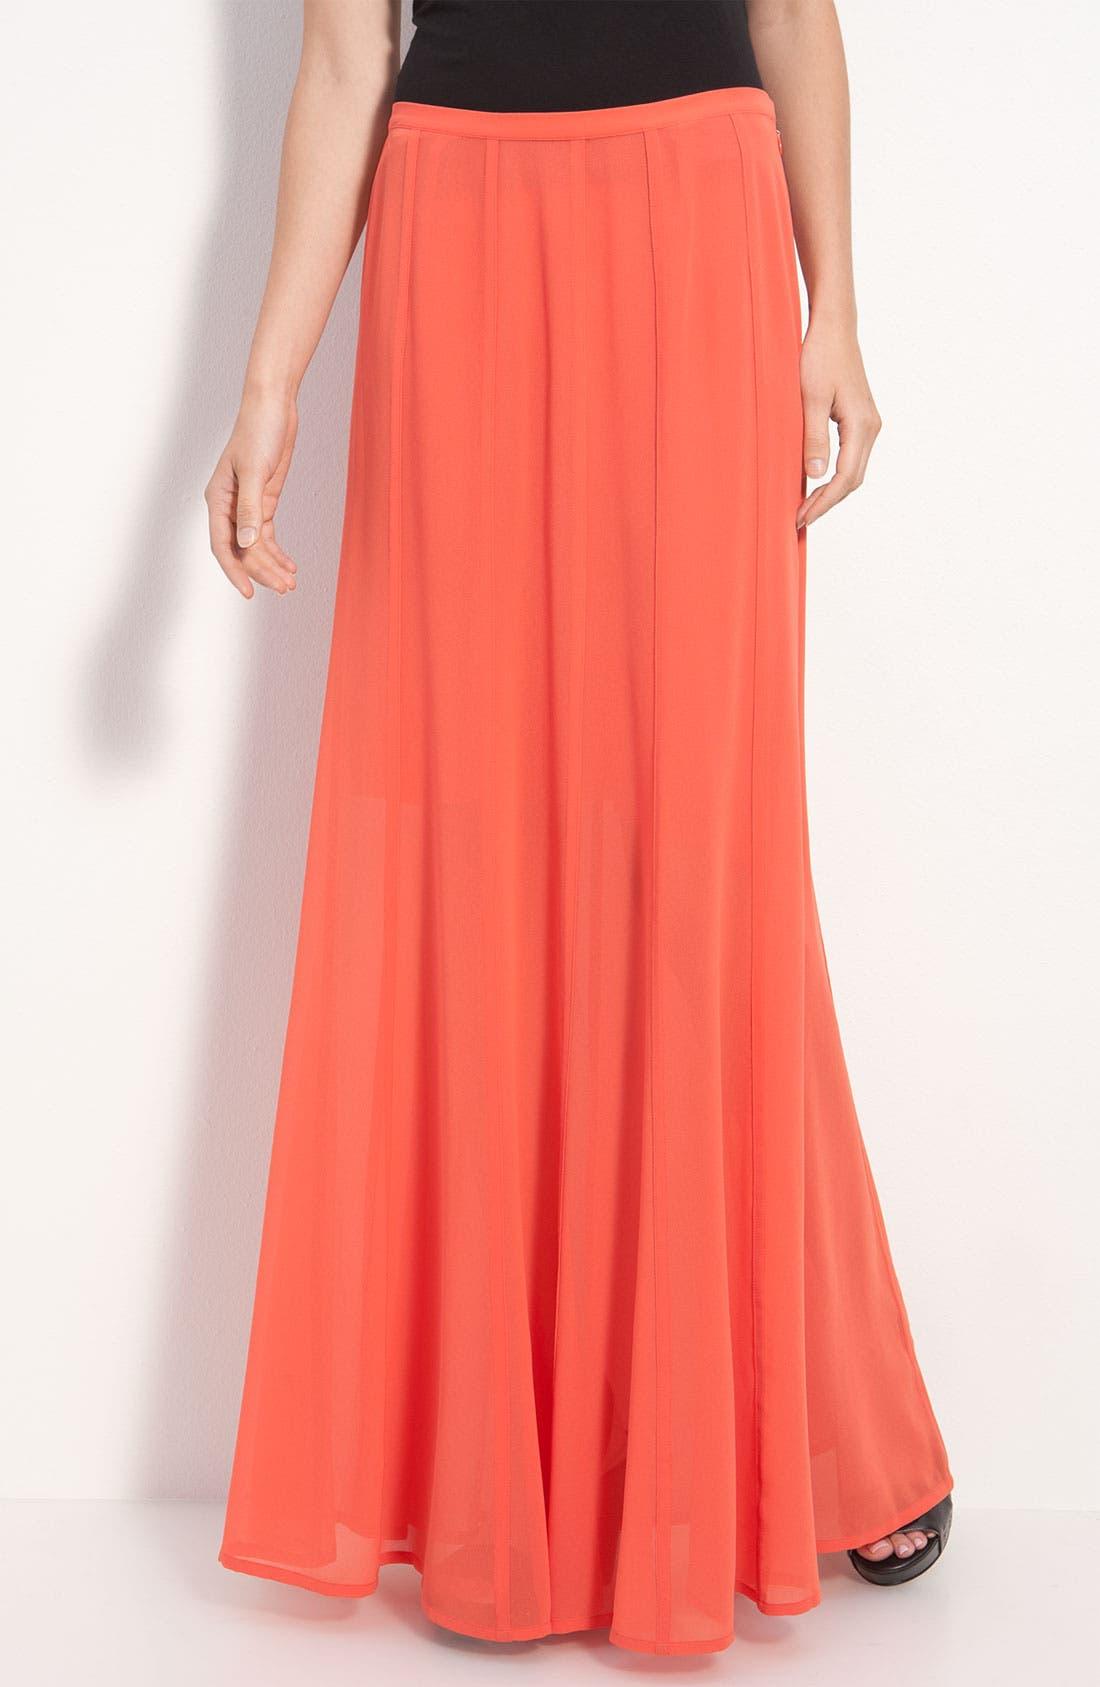 Alternate Image 1 Selected - Hinge® Sheer Chiffon Maxi Skirt